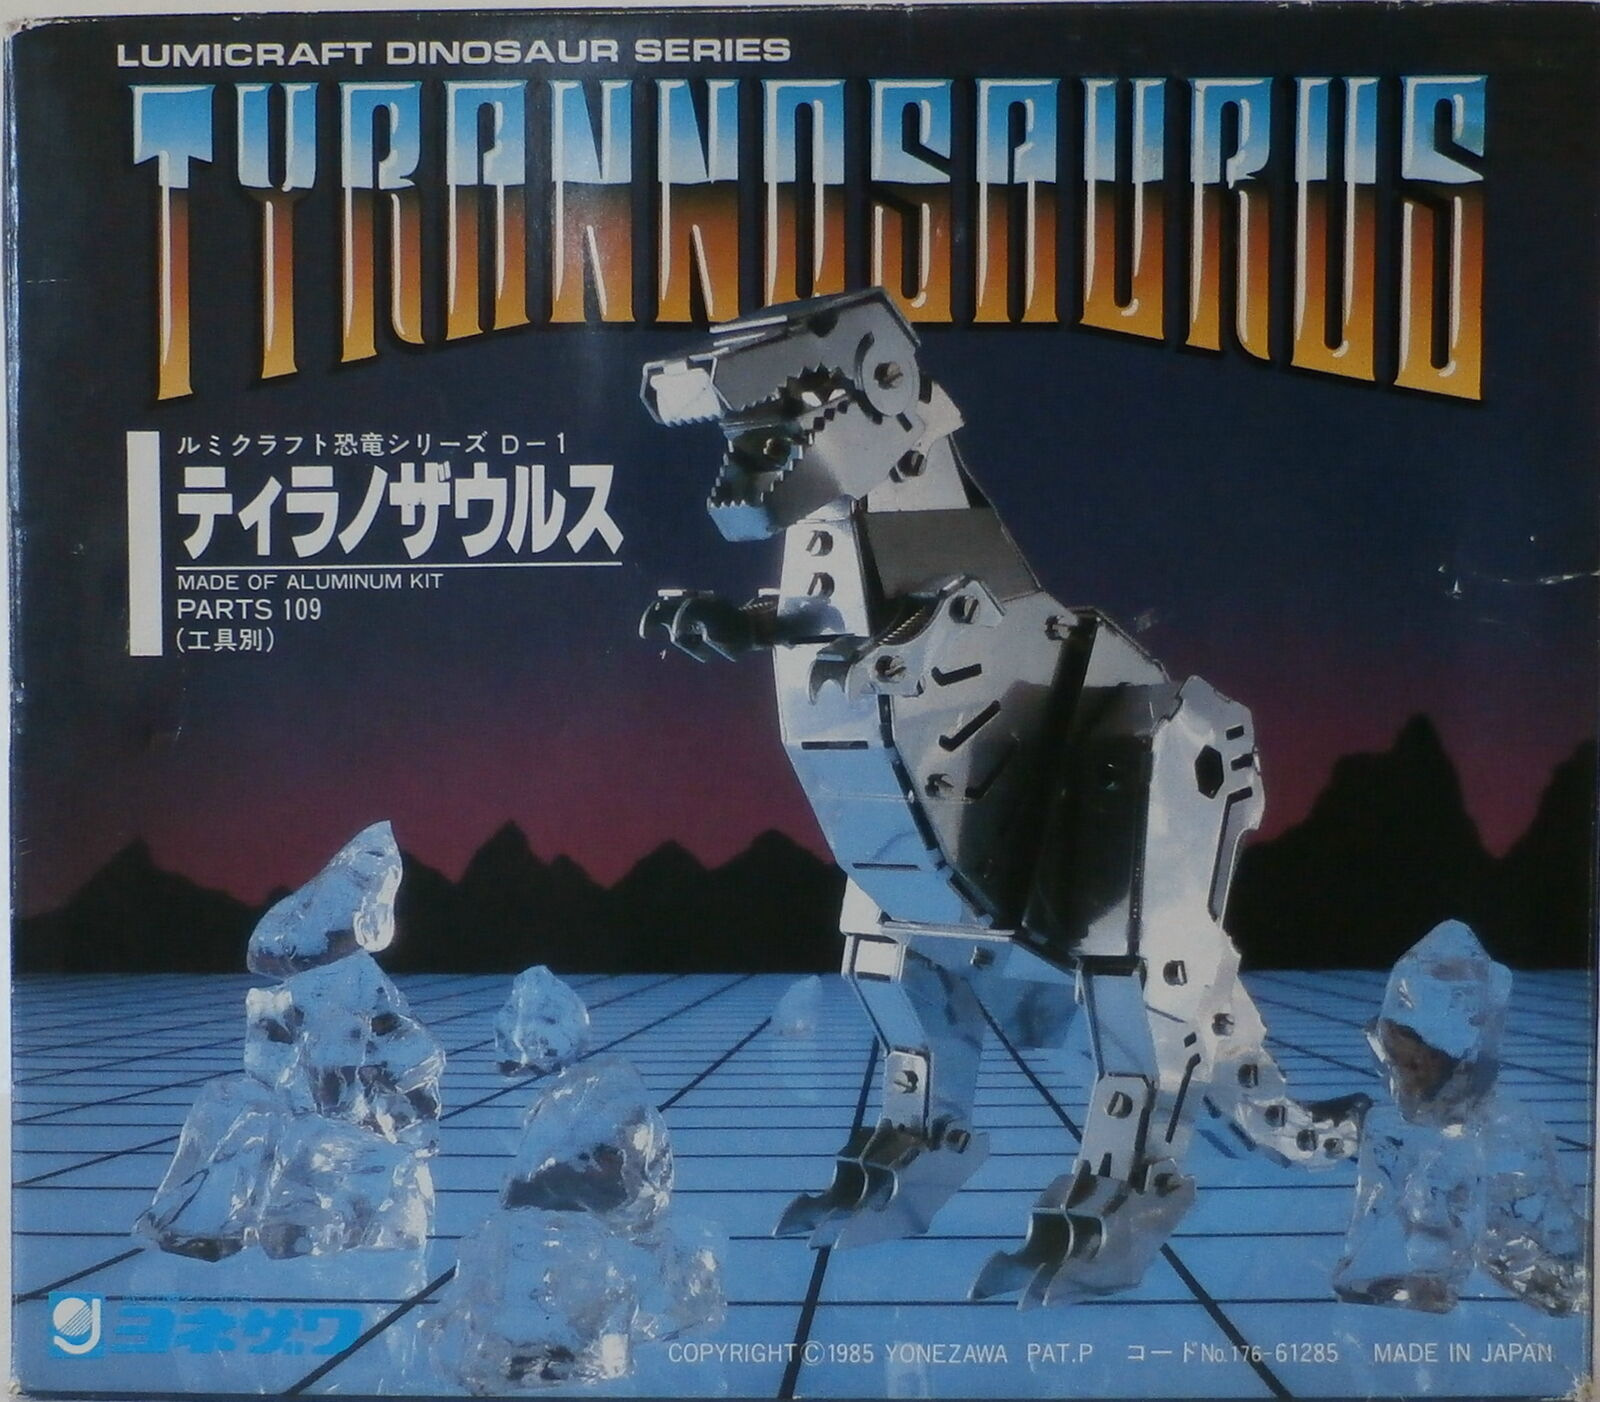 Lumicraft dinosaurio serie Tiranosaurio (1985) Nueva En Caja